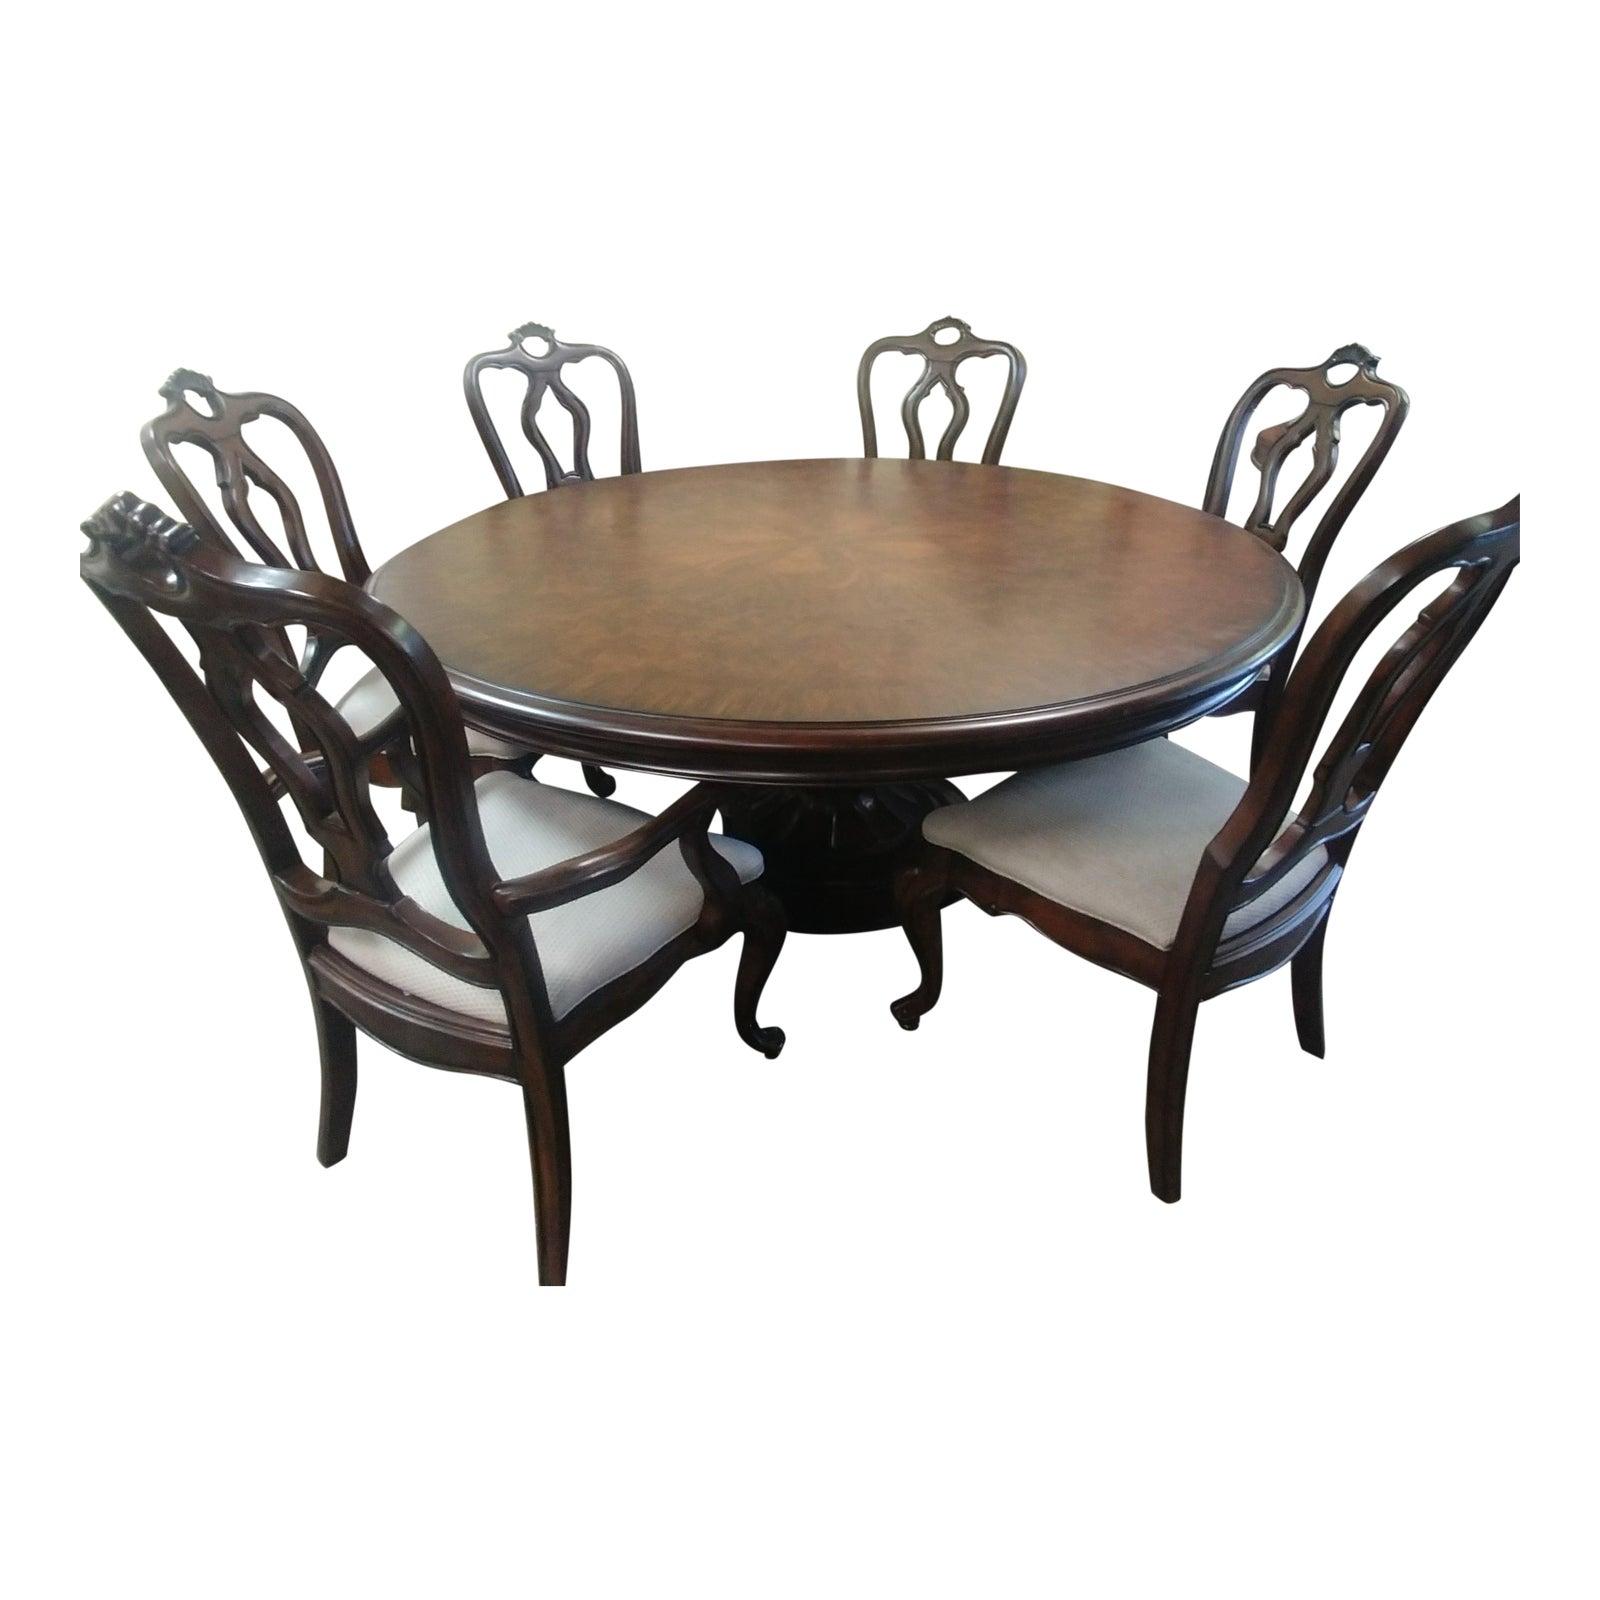 rustic thomasville furniture hills of tuscany dark rustico